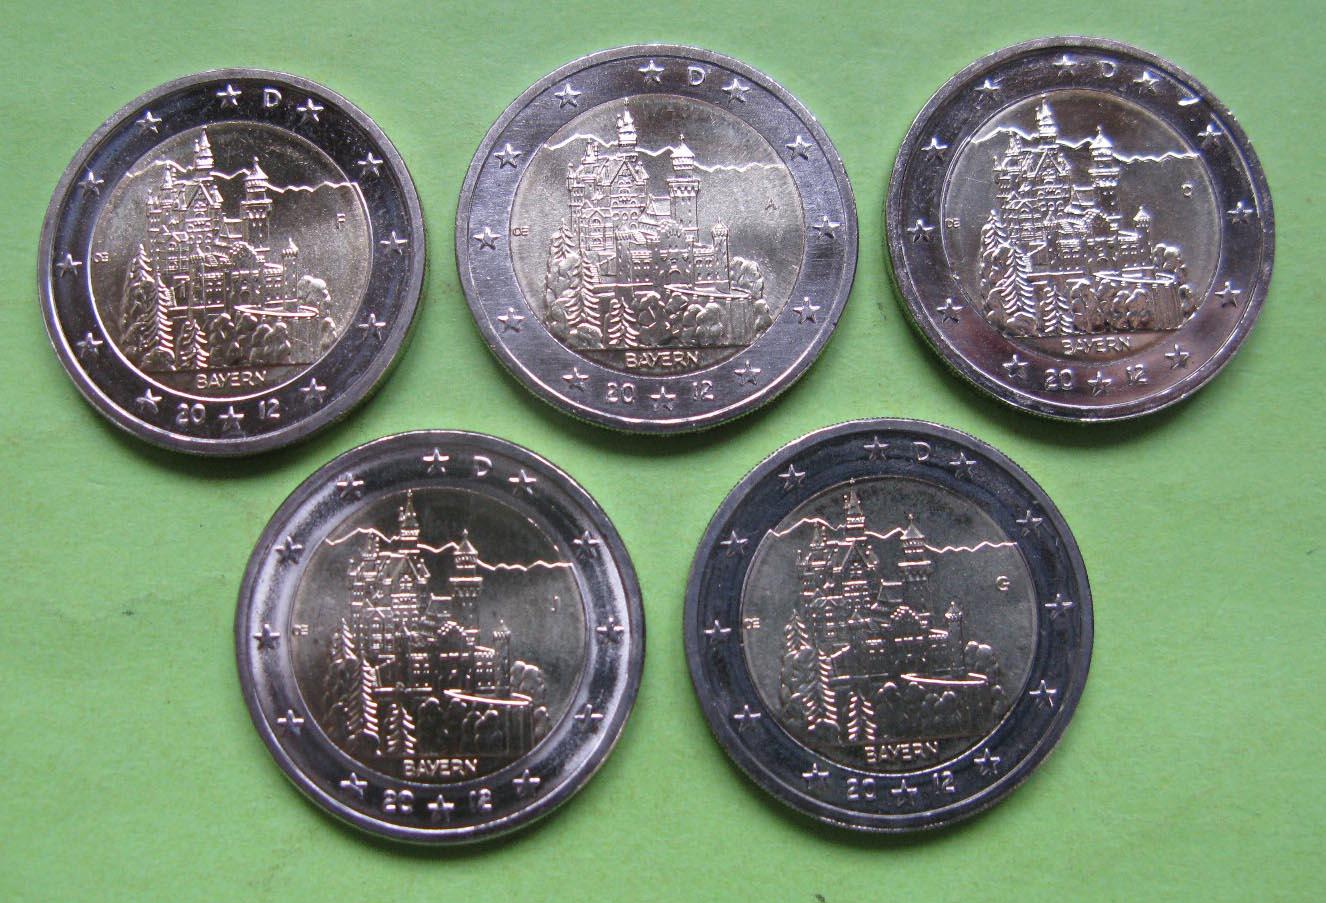 Германия 2 евро 2012 г. Бавария (A,D,F,G,J ), UNC